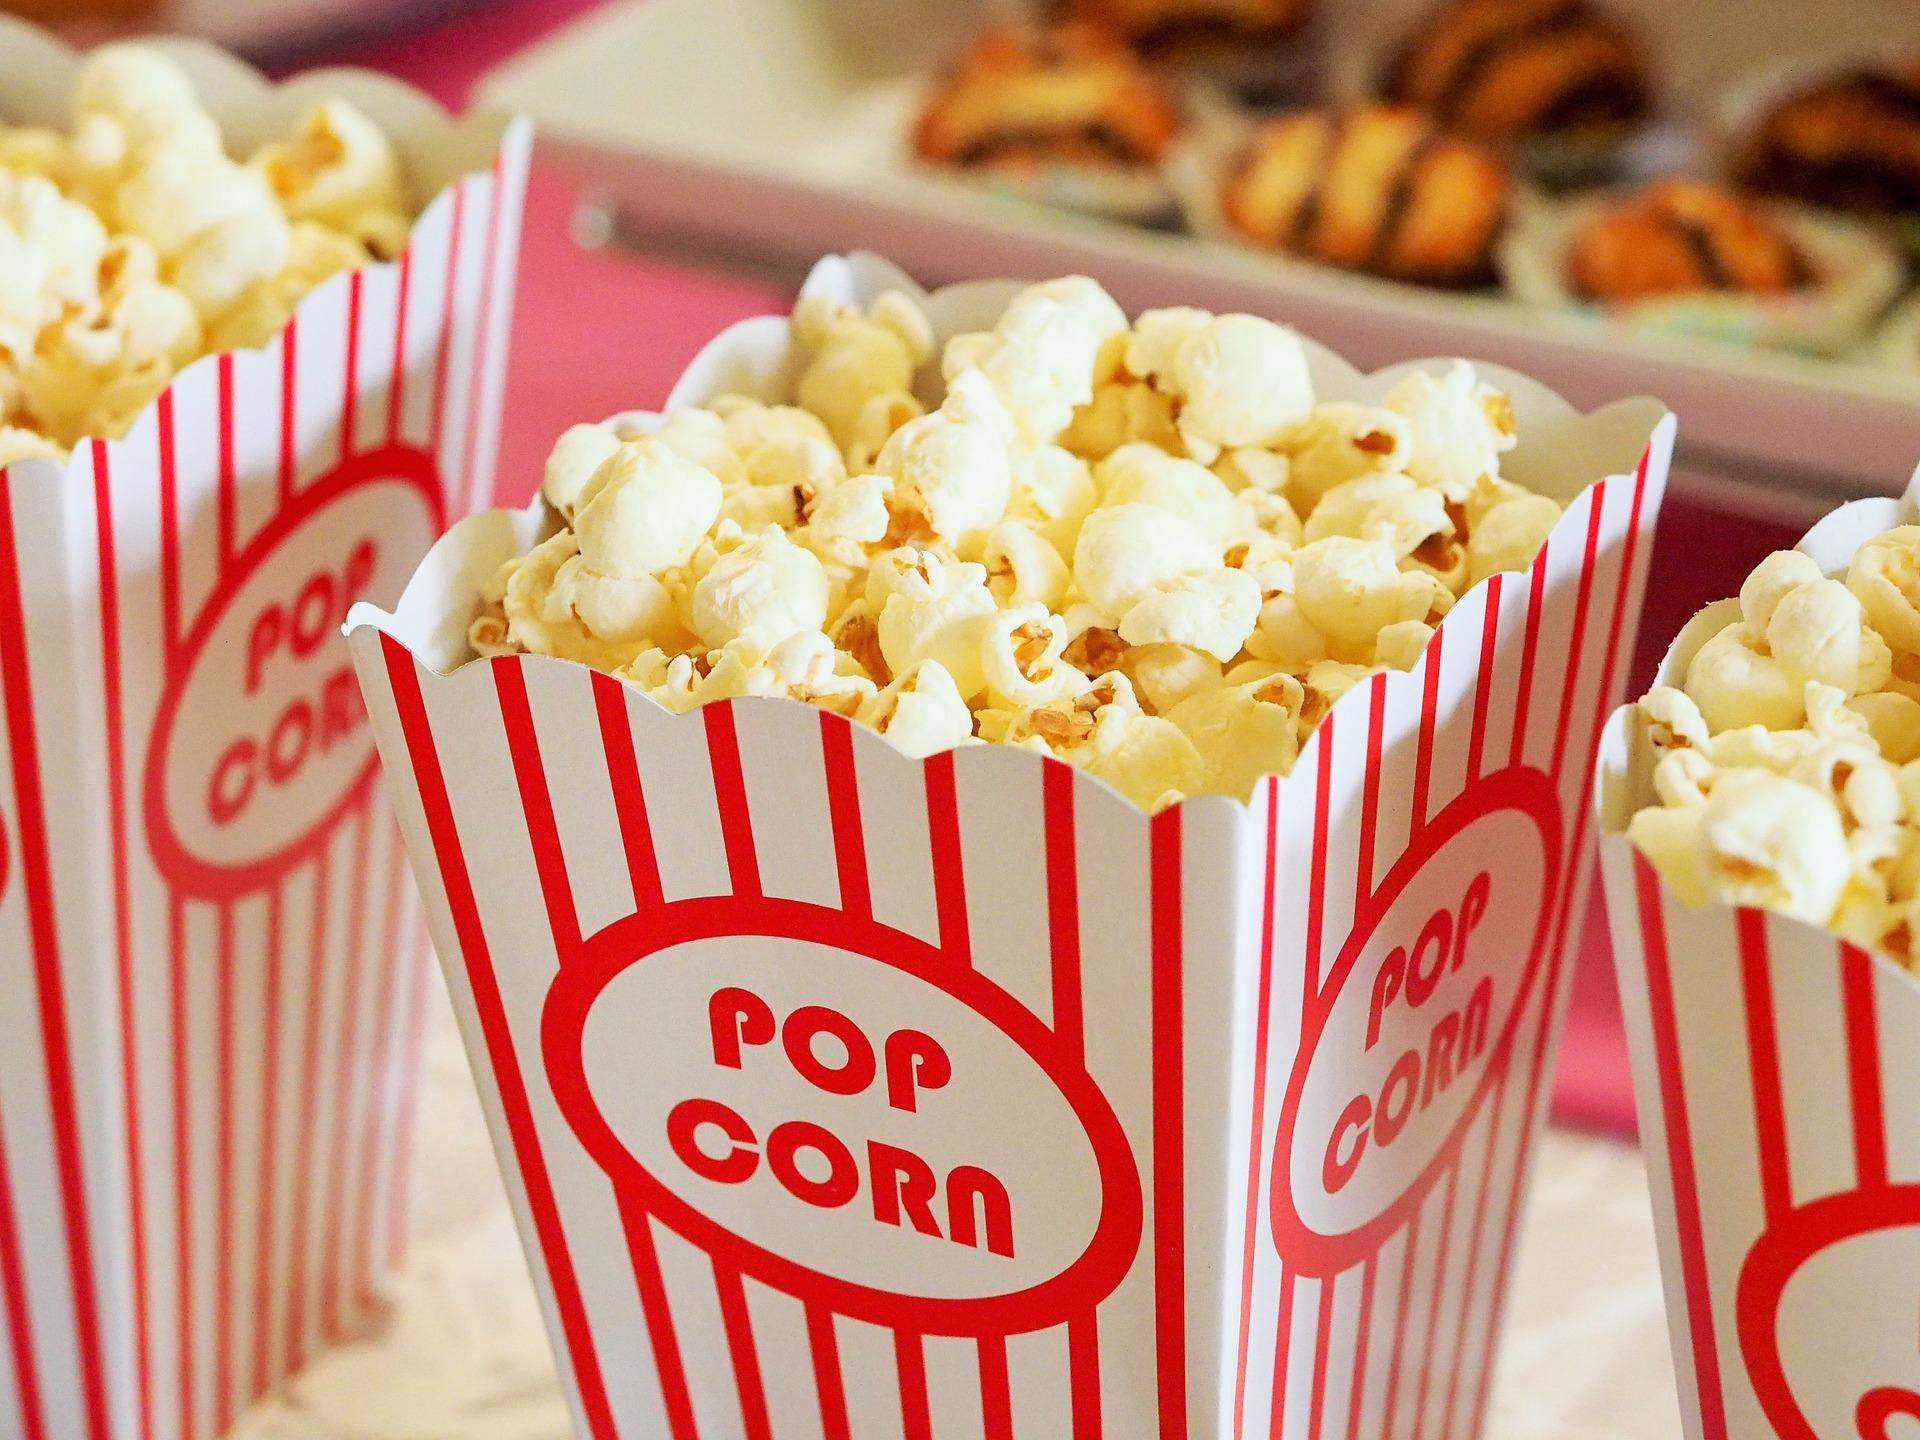 Stand Pop-Corn